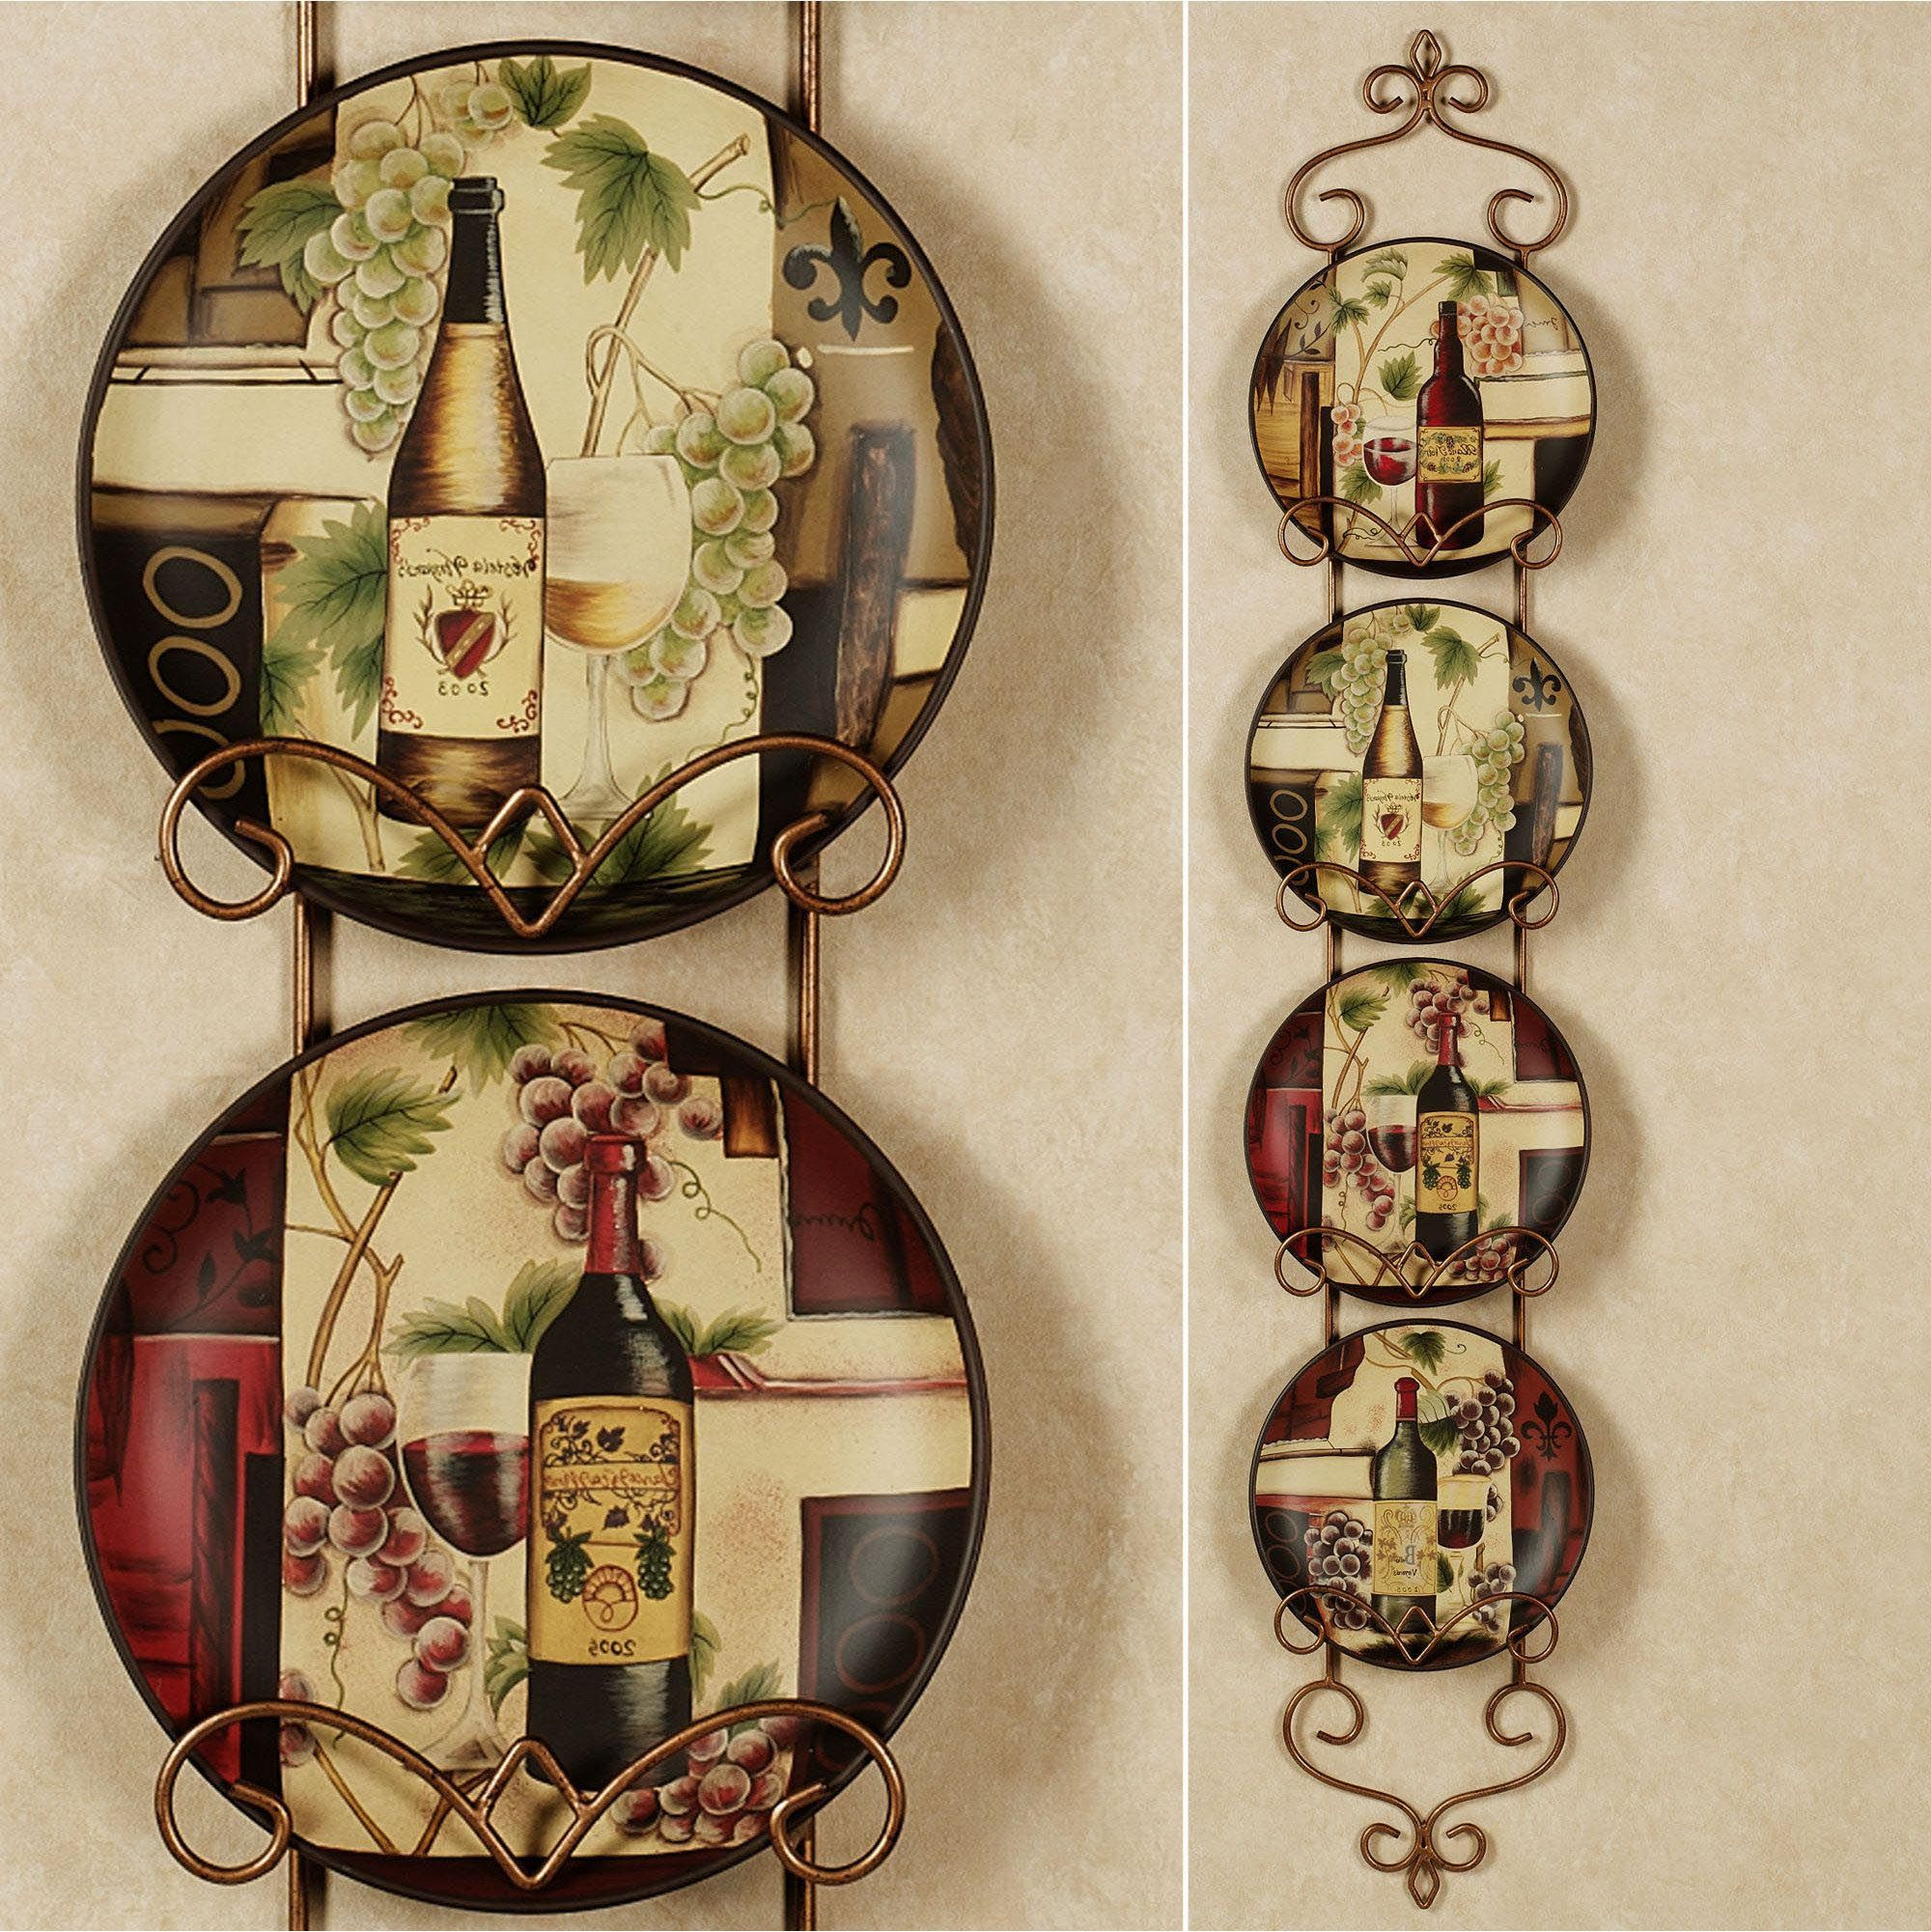 Decorative Plates for Kitchen Wall   Decorative Plates   Pinterest ...